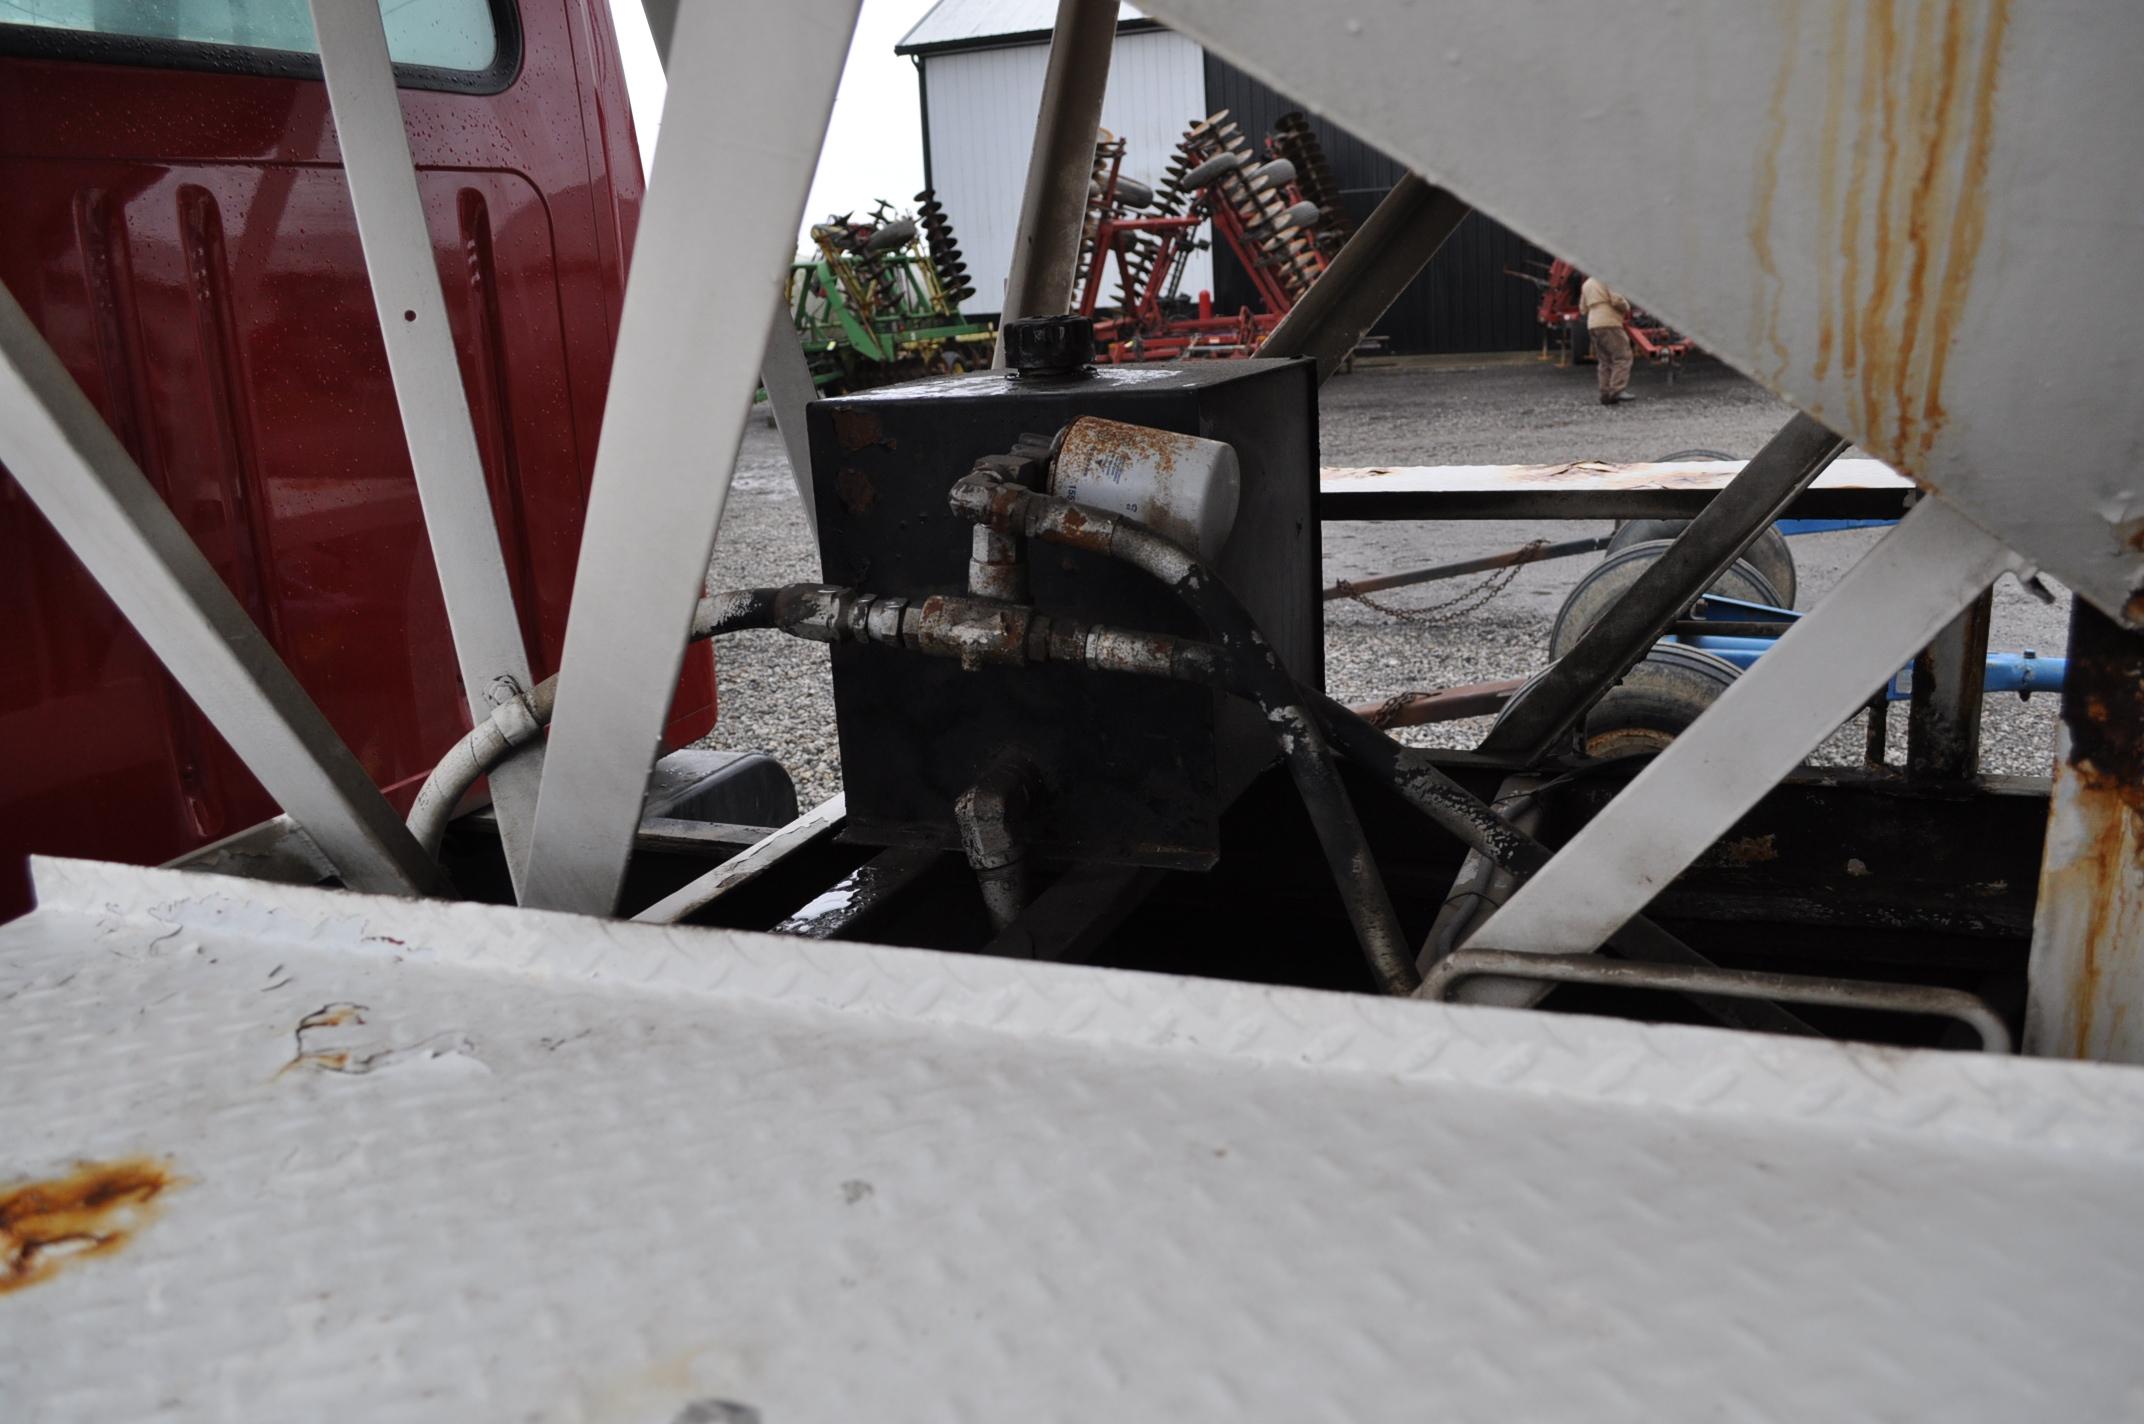 2000 International 4900 dry fertilizer tender truck, single axle, DT466E, Spicer 6 spd, spring ride, - Image 16 of 21